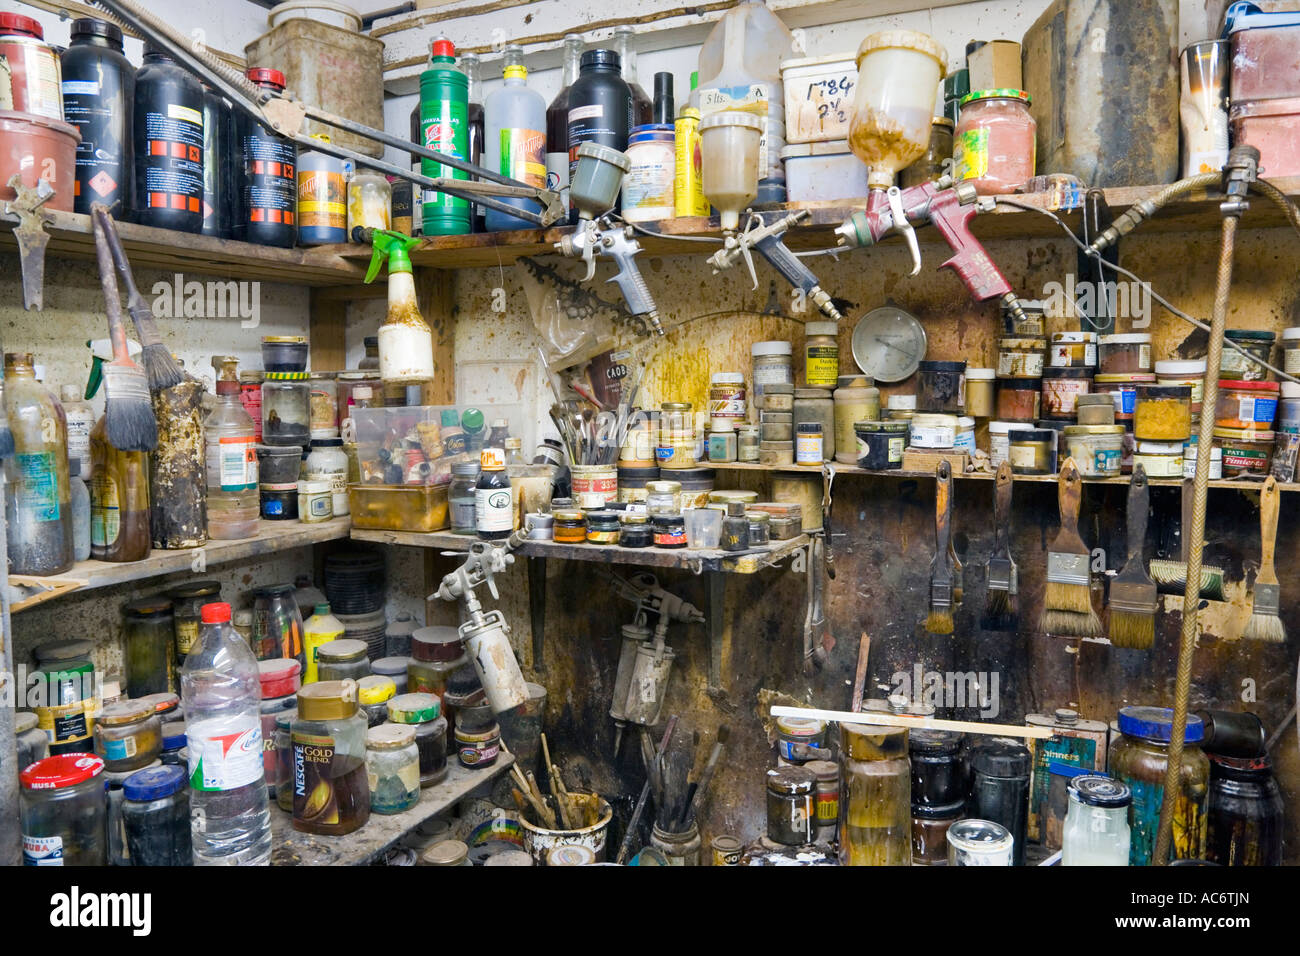 Gibraltar Detail In Furniture Restoring Workshop Of Sanquinetti Main Street